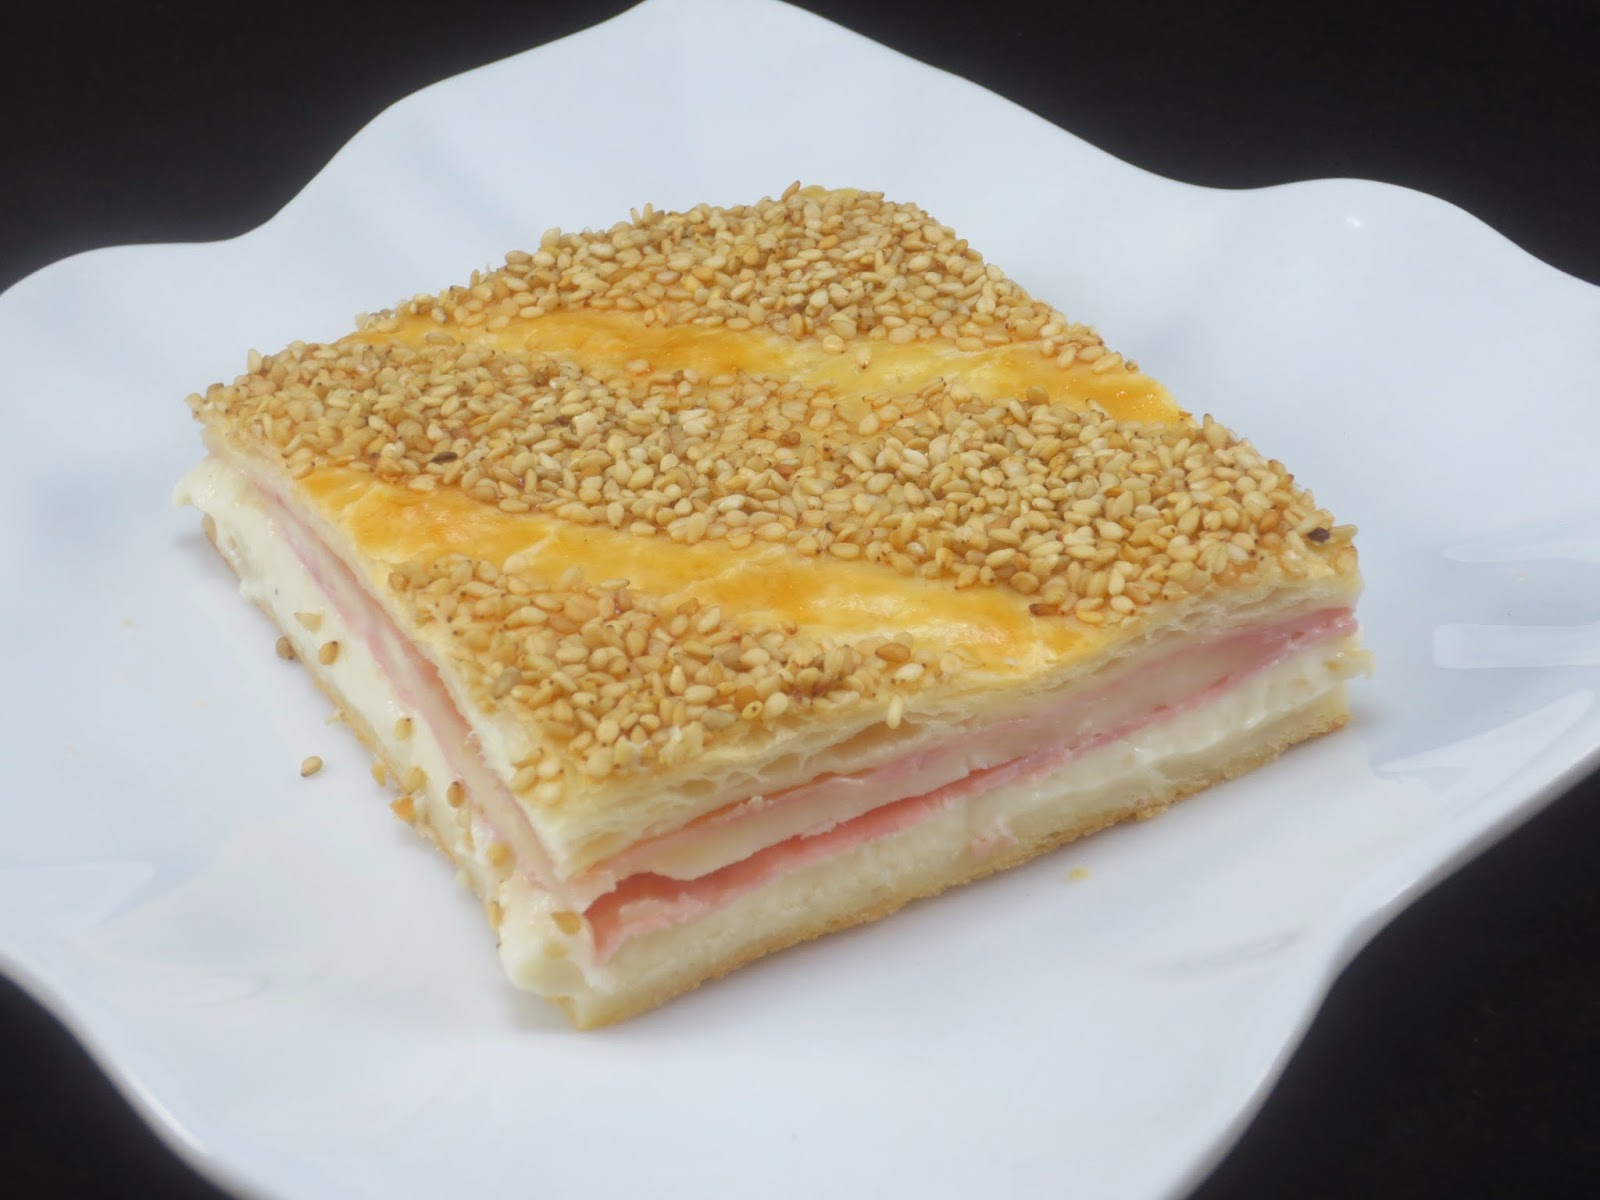 Empanada de hojaldre de jamón y queso Ana Sevilla cocina tradicional